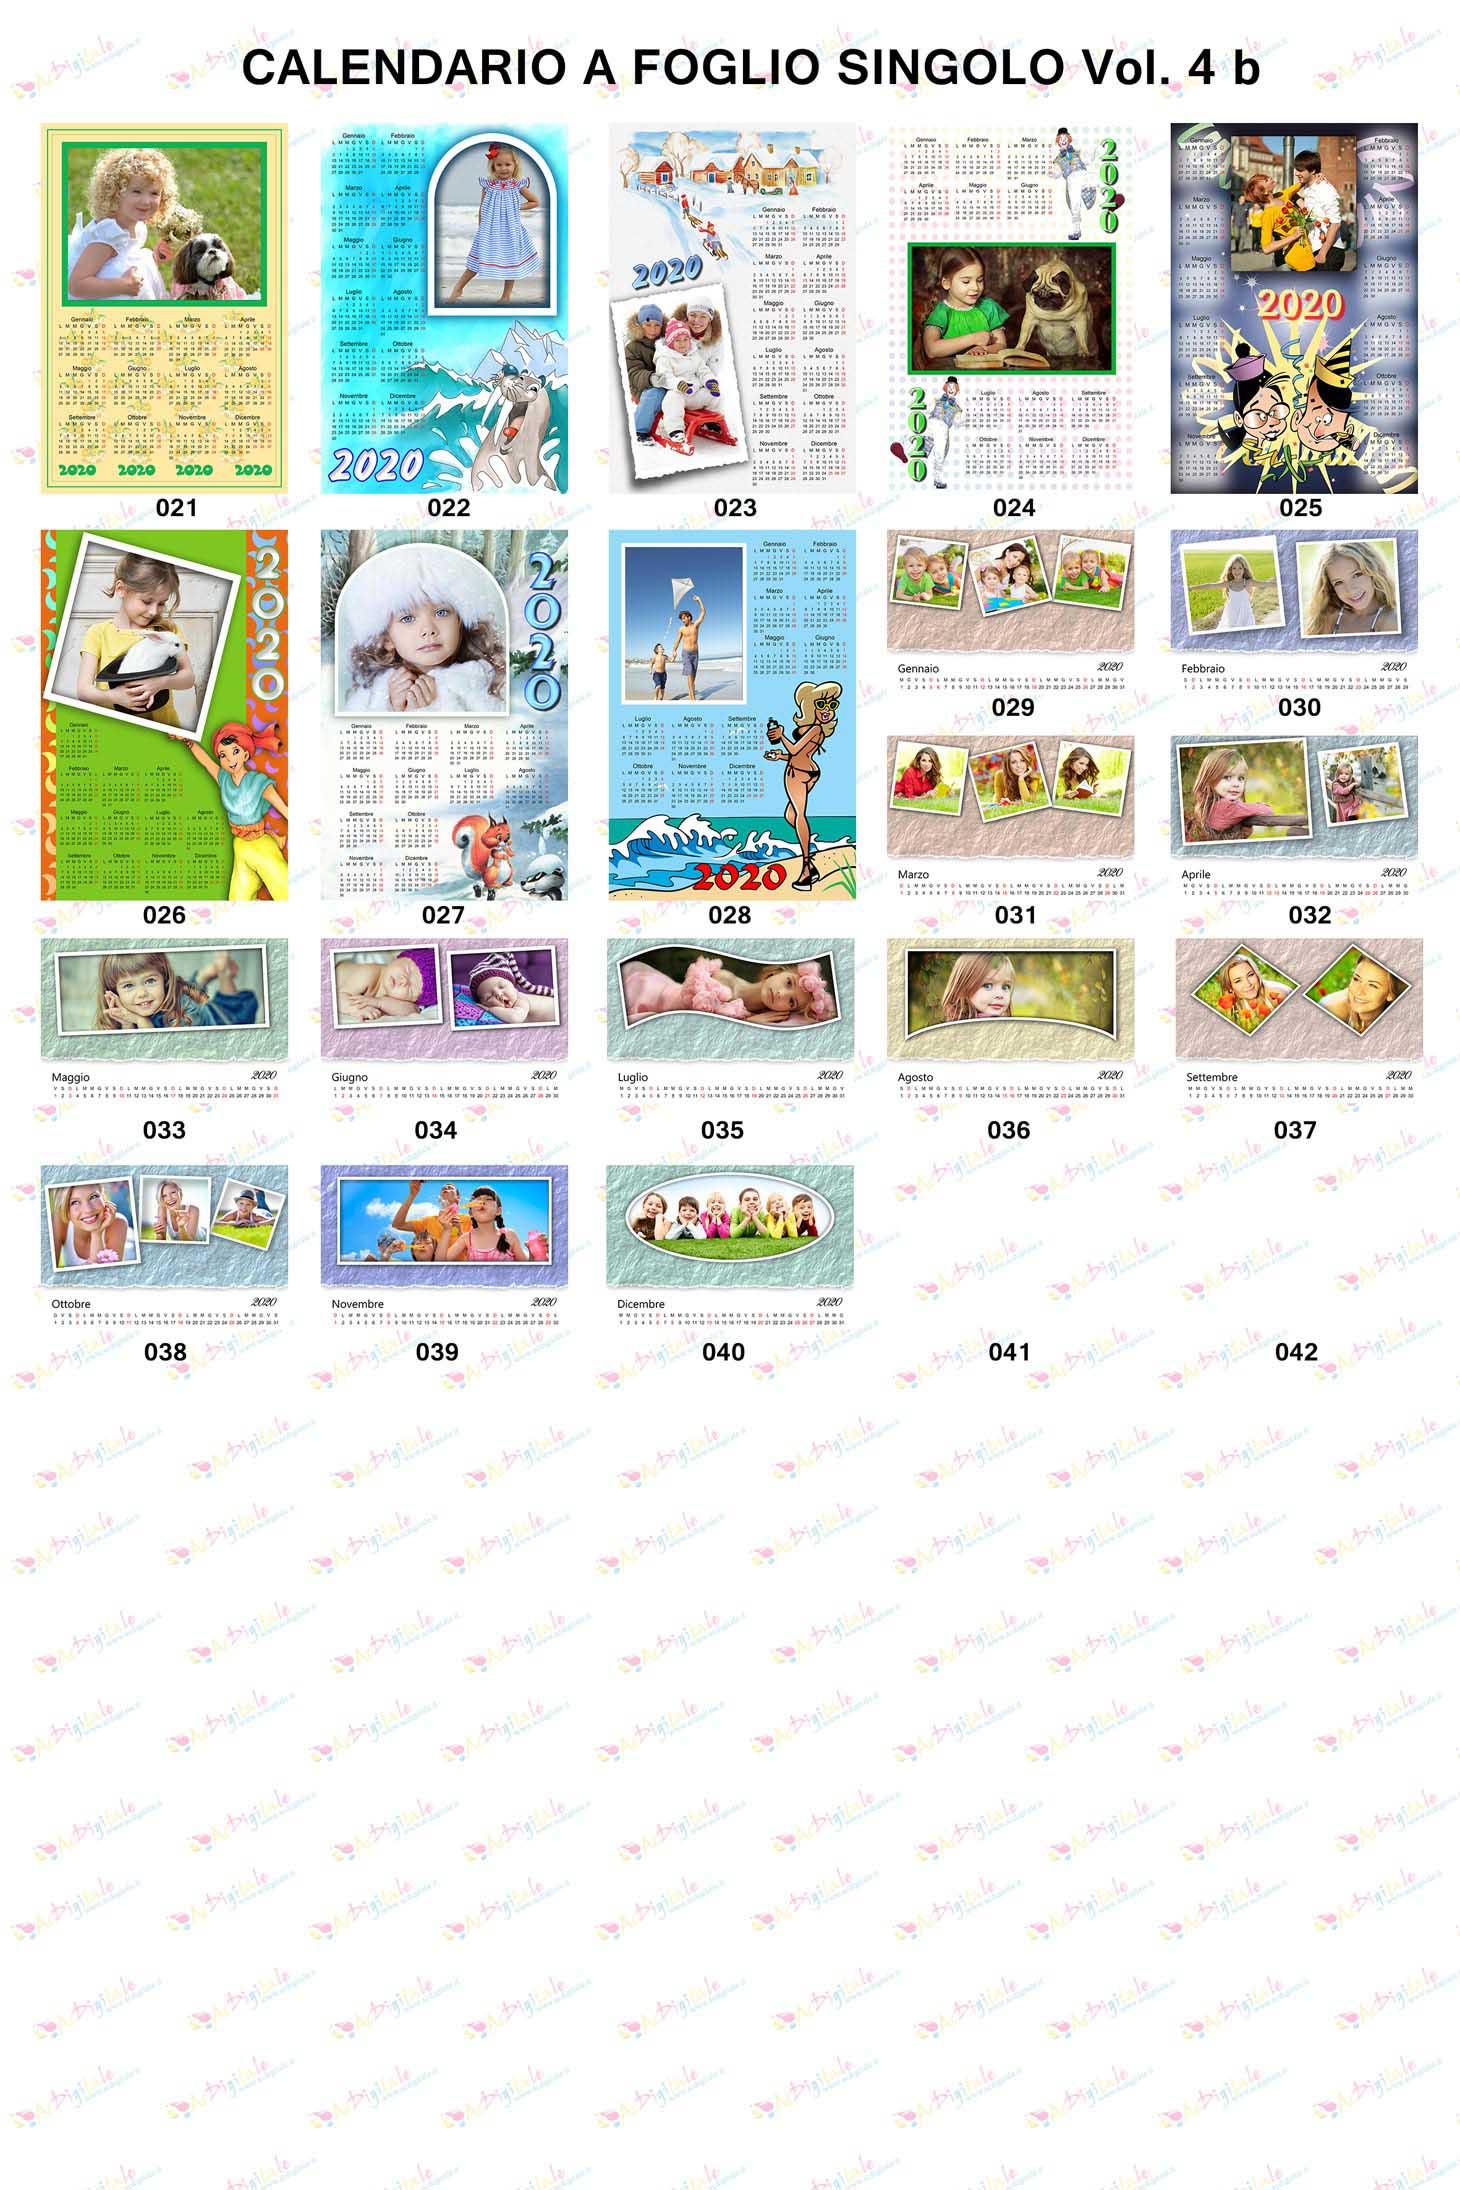 Anteprima calendari personalizzati 2020 volume 4b